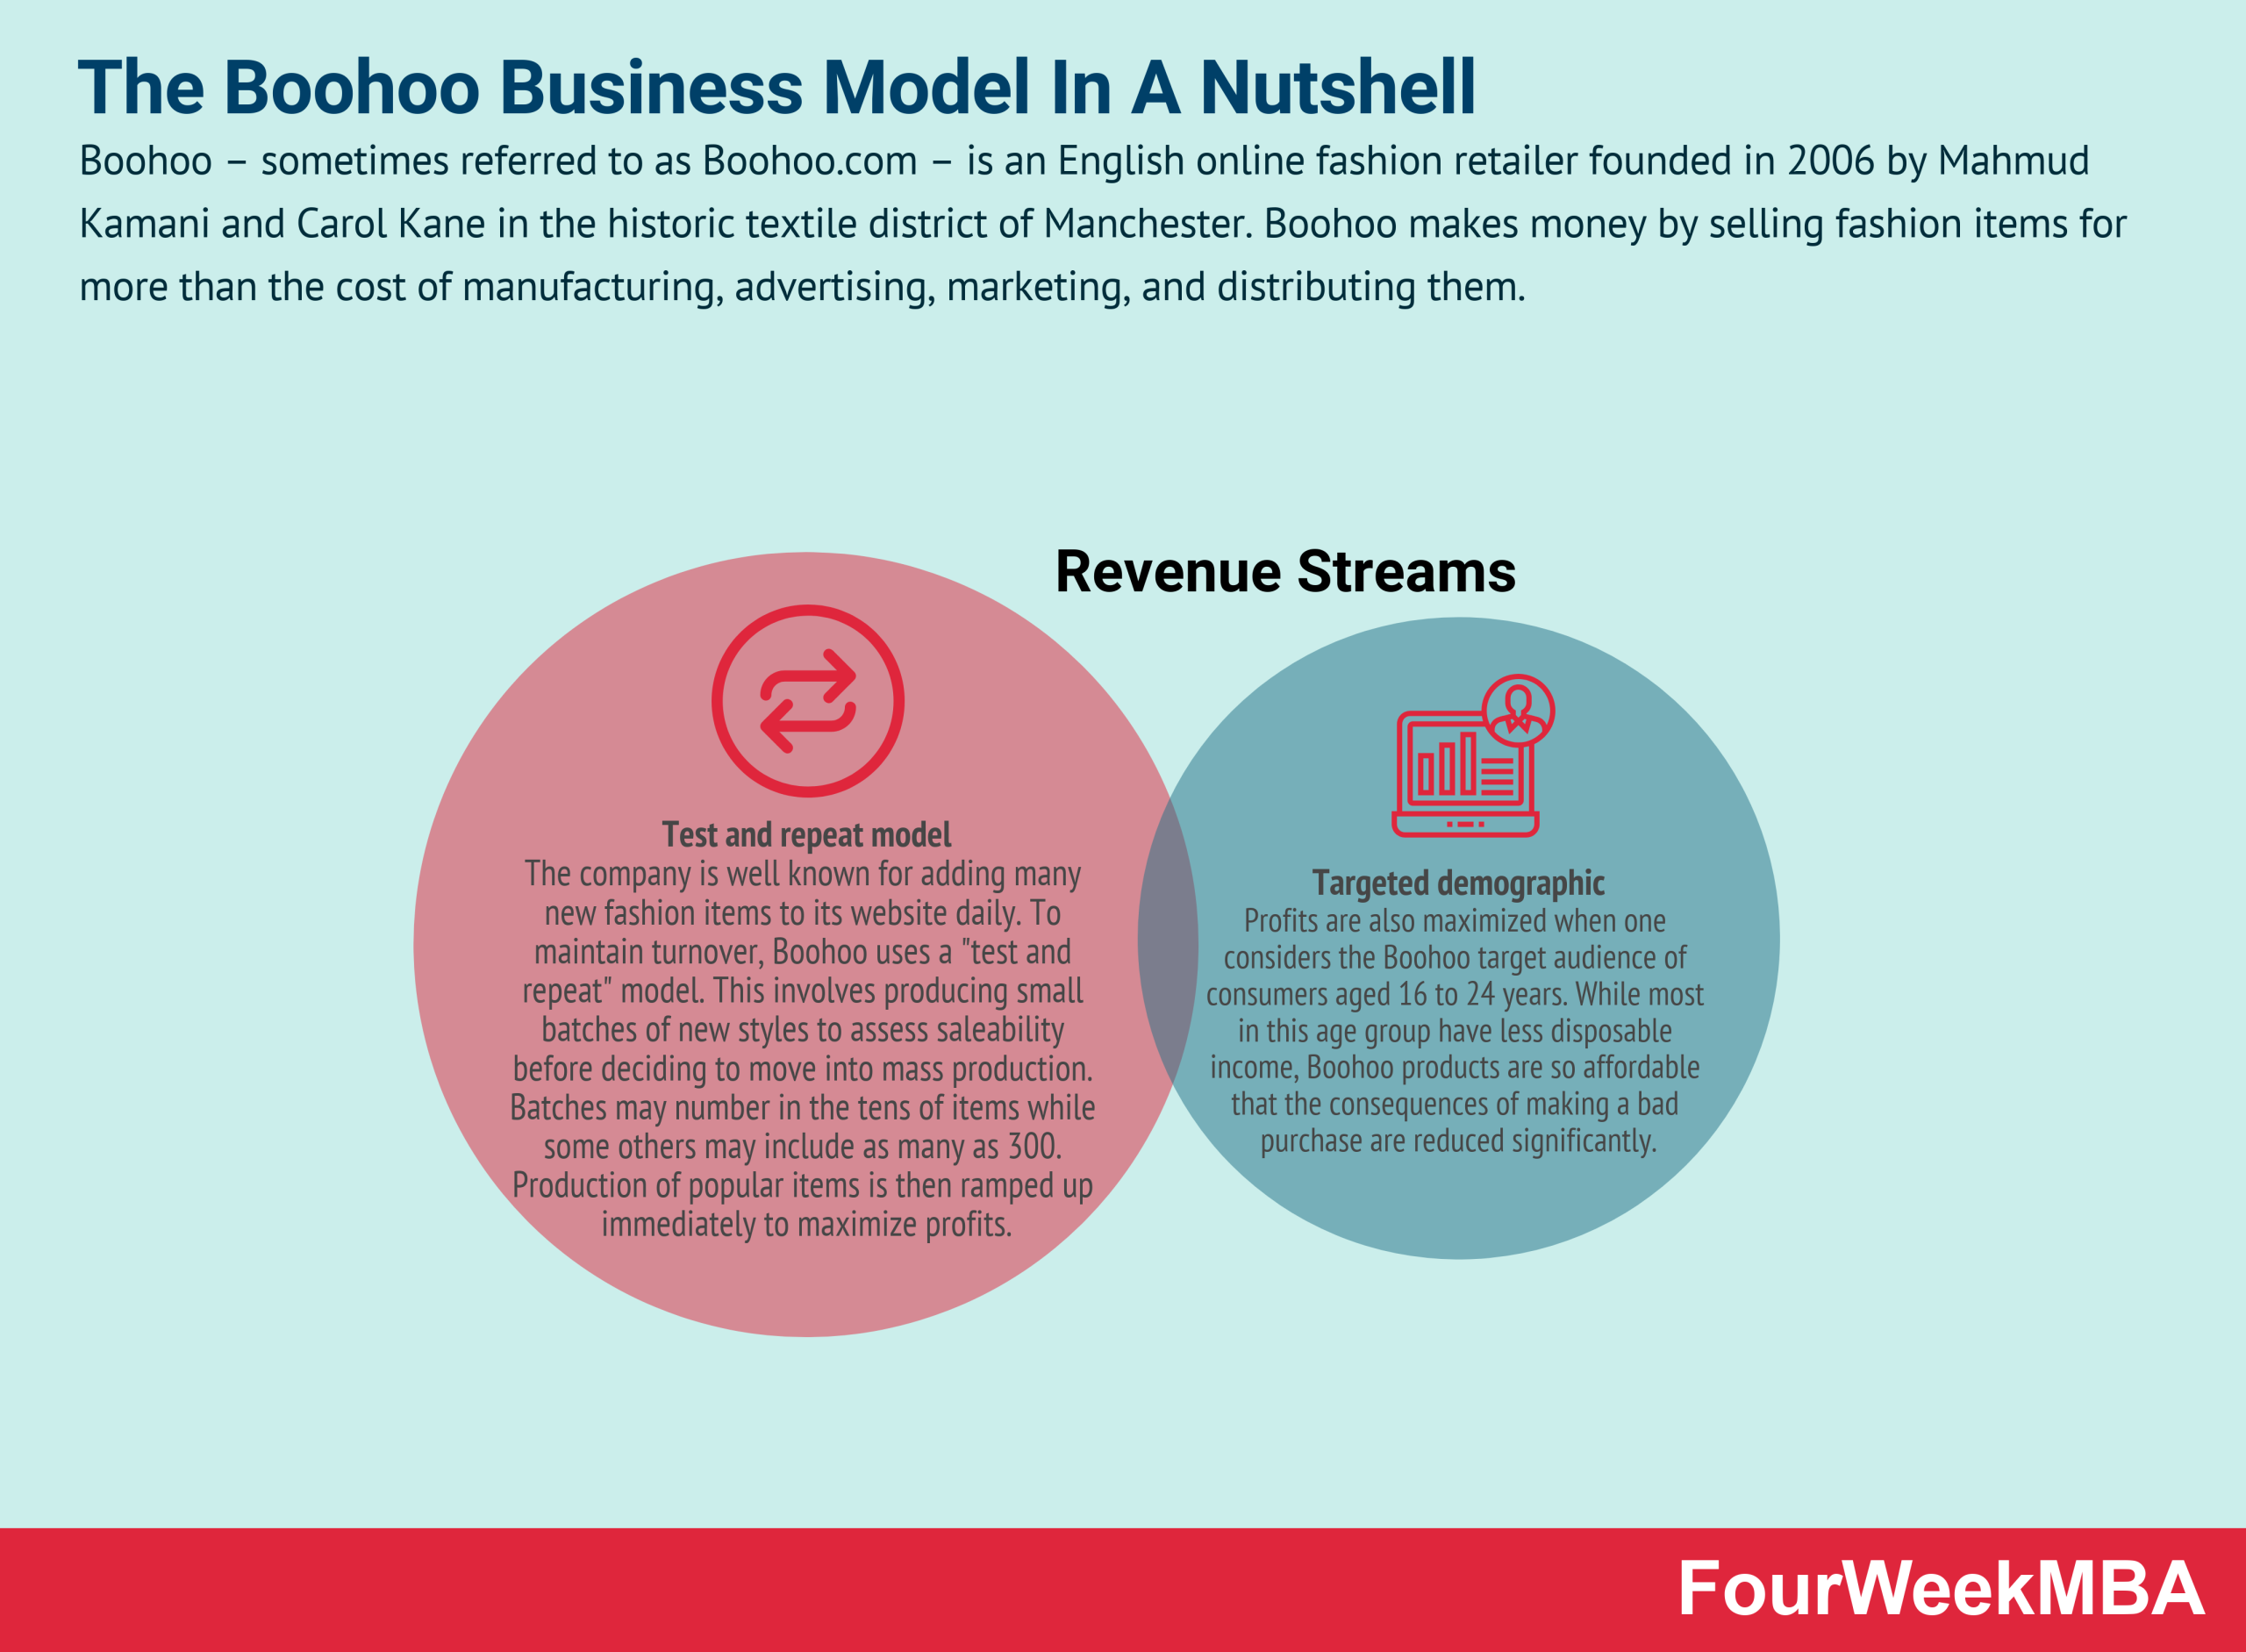 boohoo-business-model